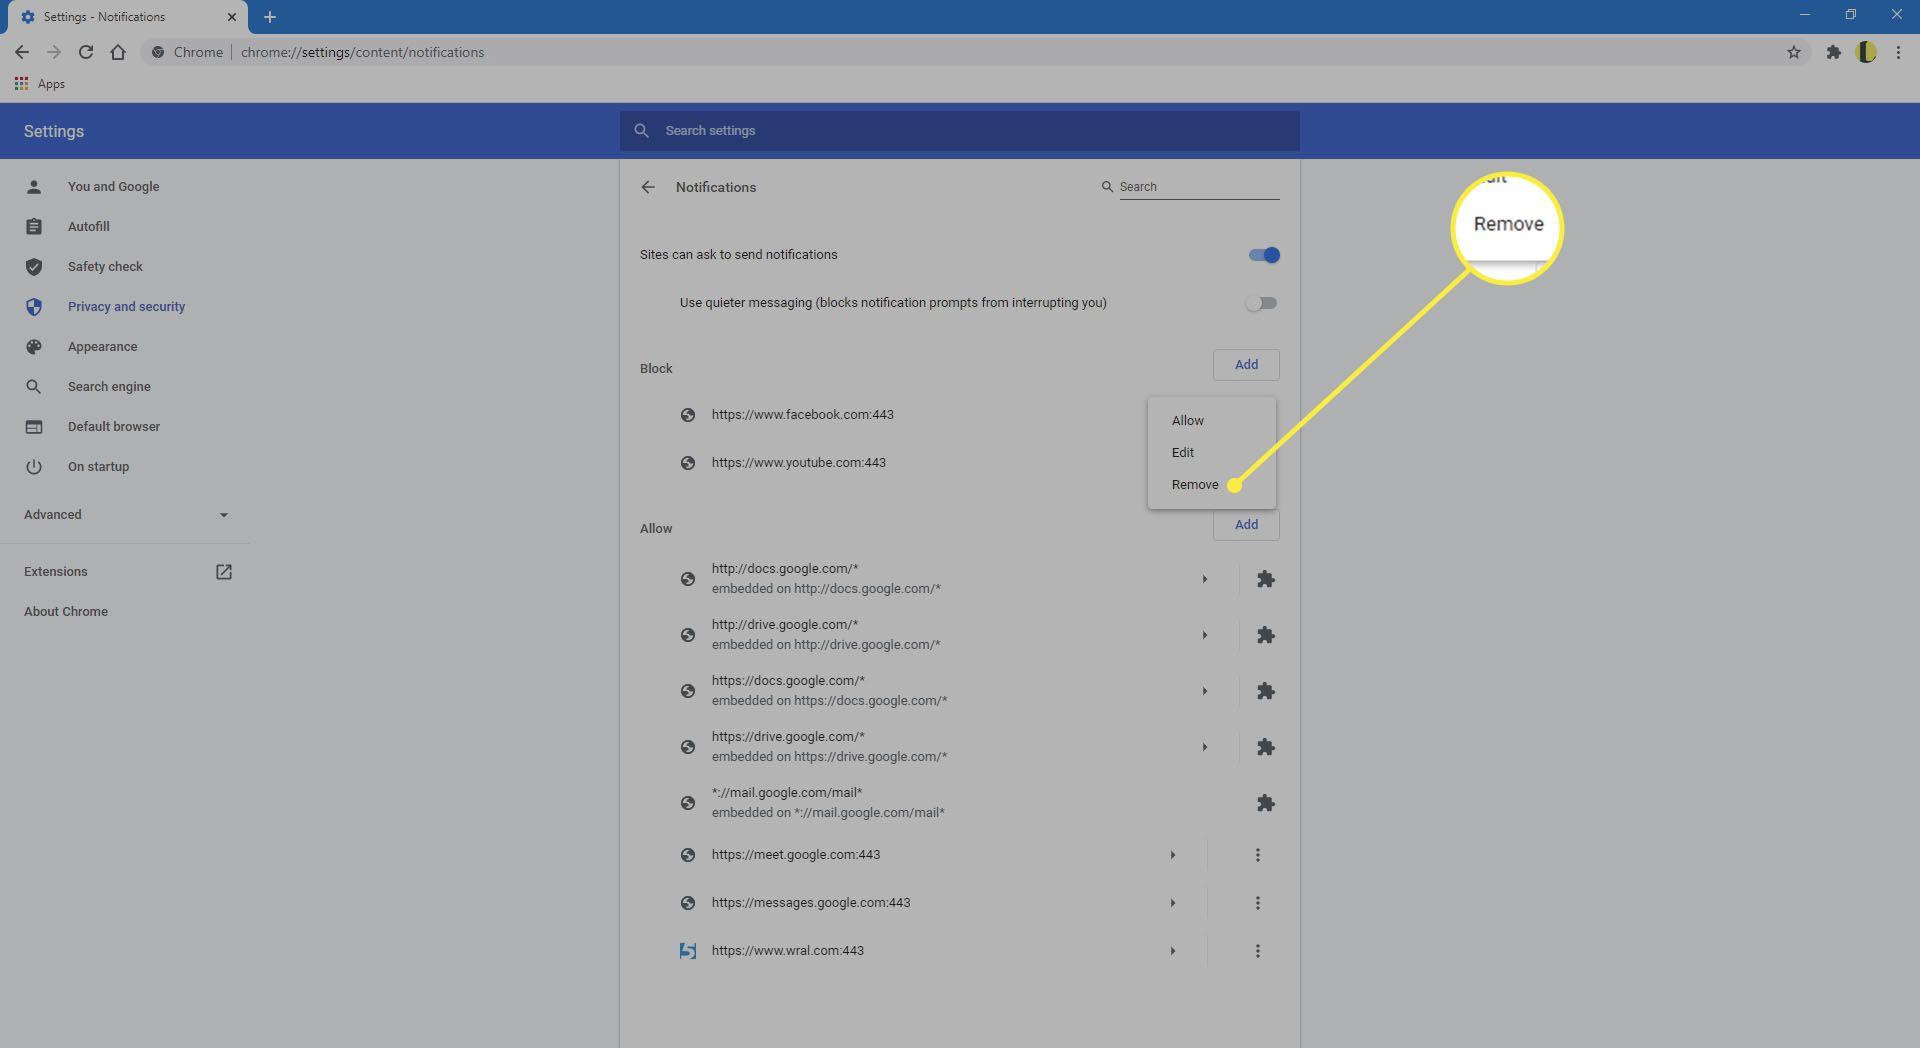 Chrome showing Notifications block list